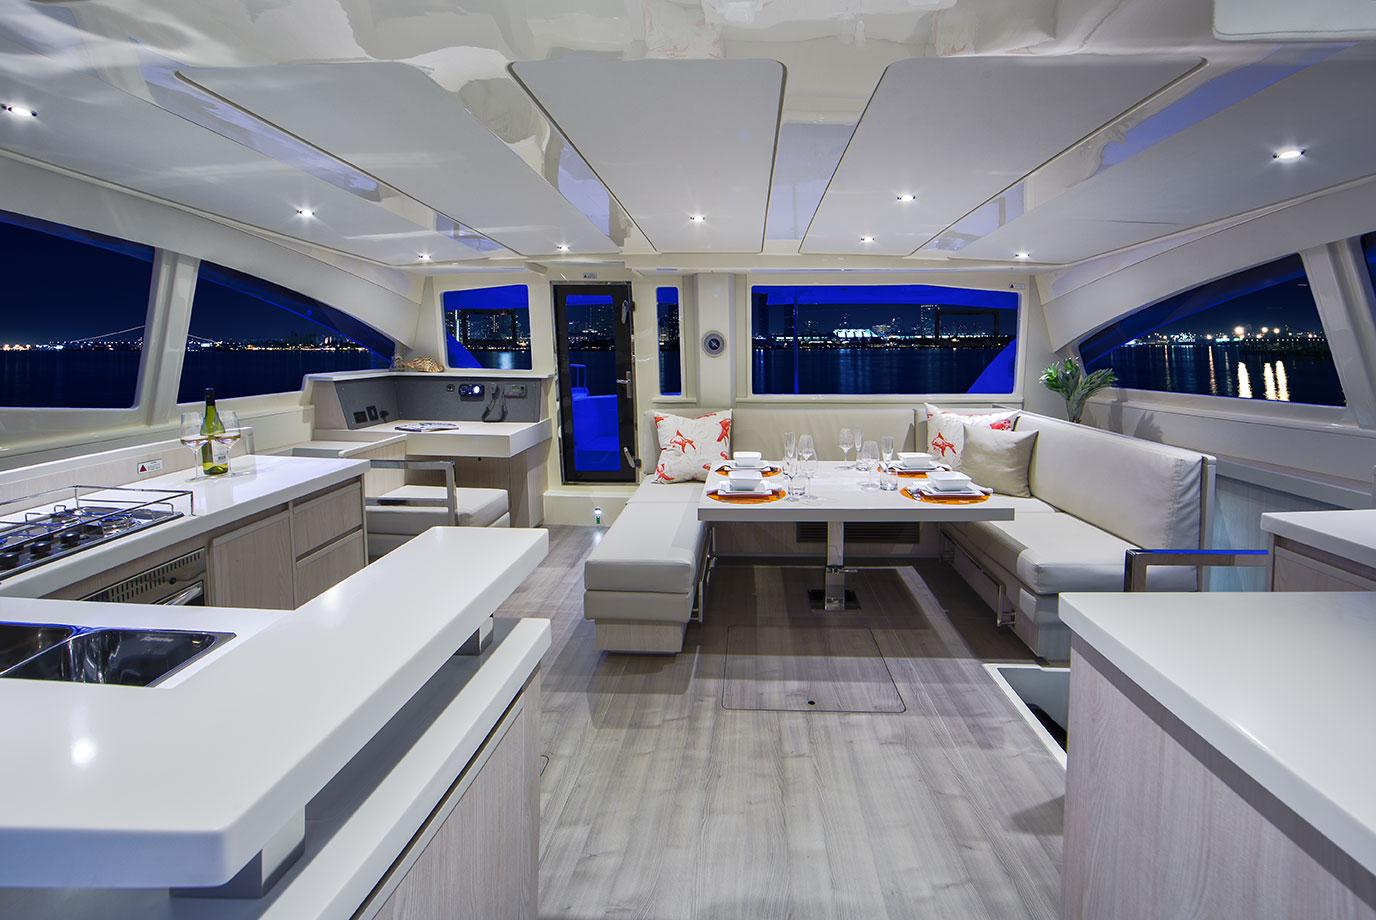 leopard 44 catamaran interior photography